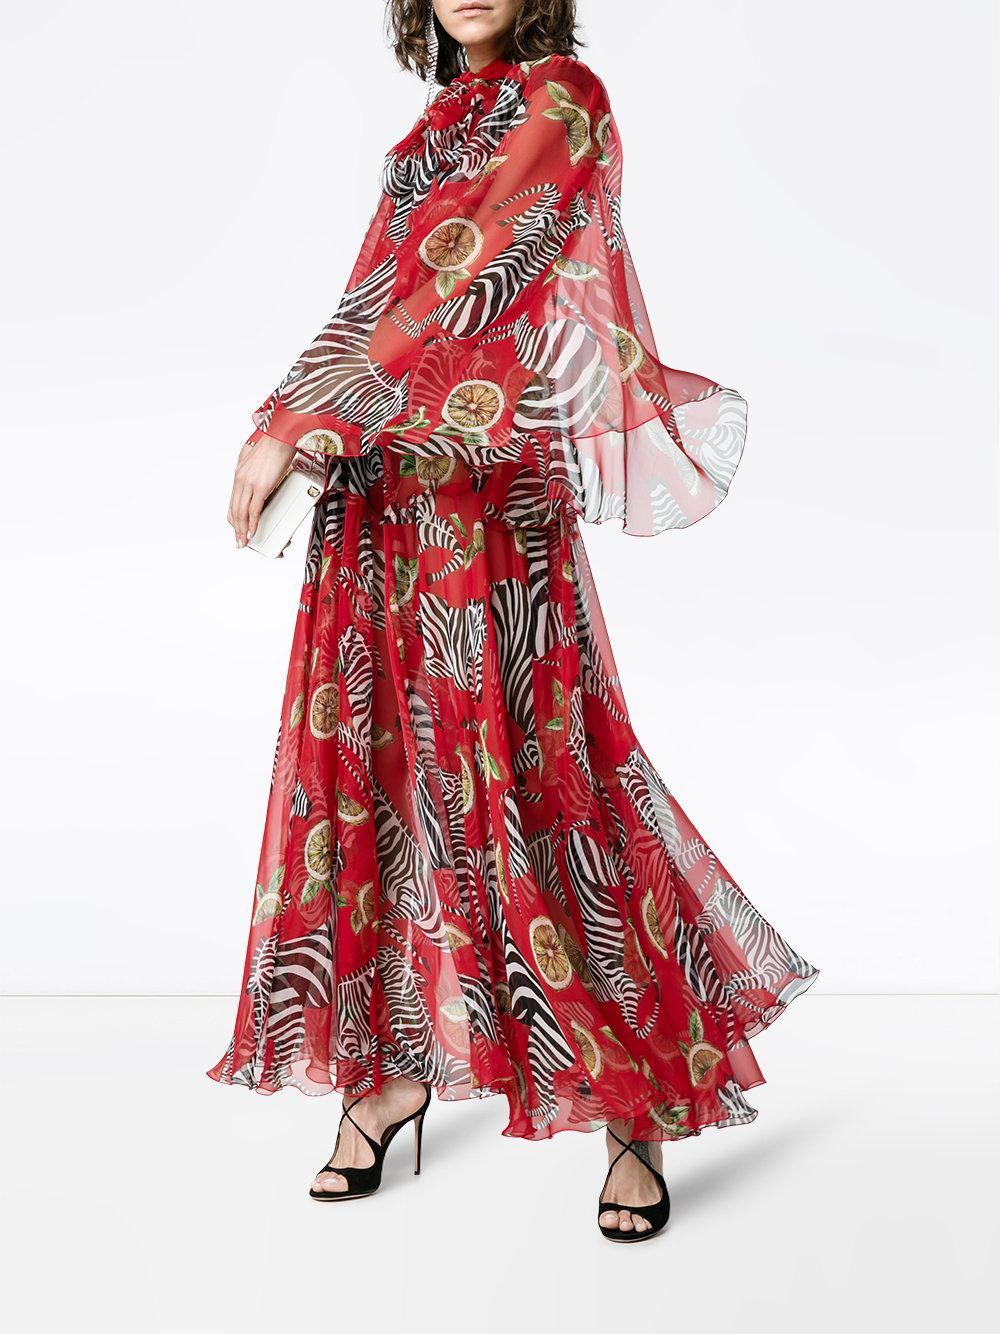 dress - Gabana Dolce zebra dress collection video